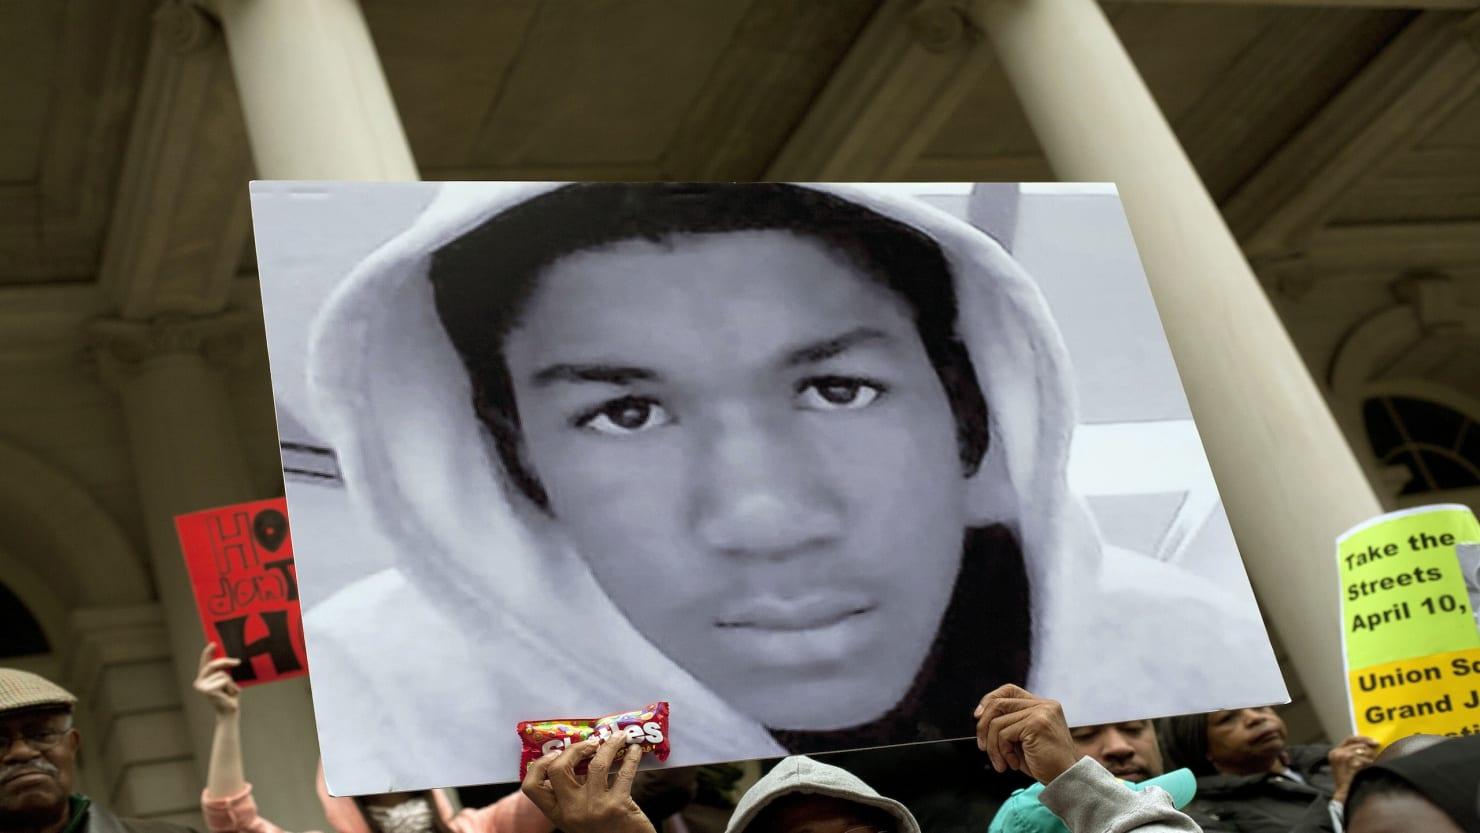 night trayvon martin died - HD1480×833